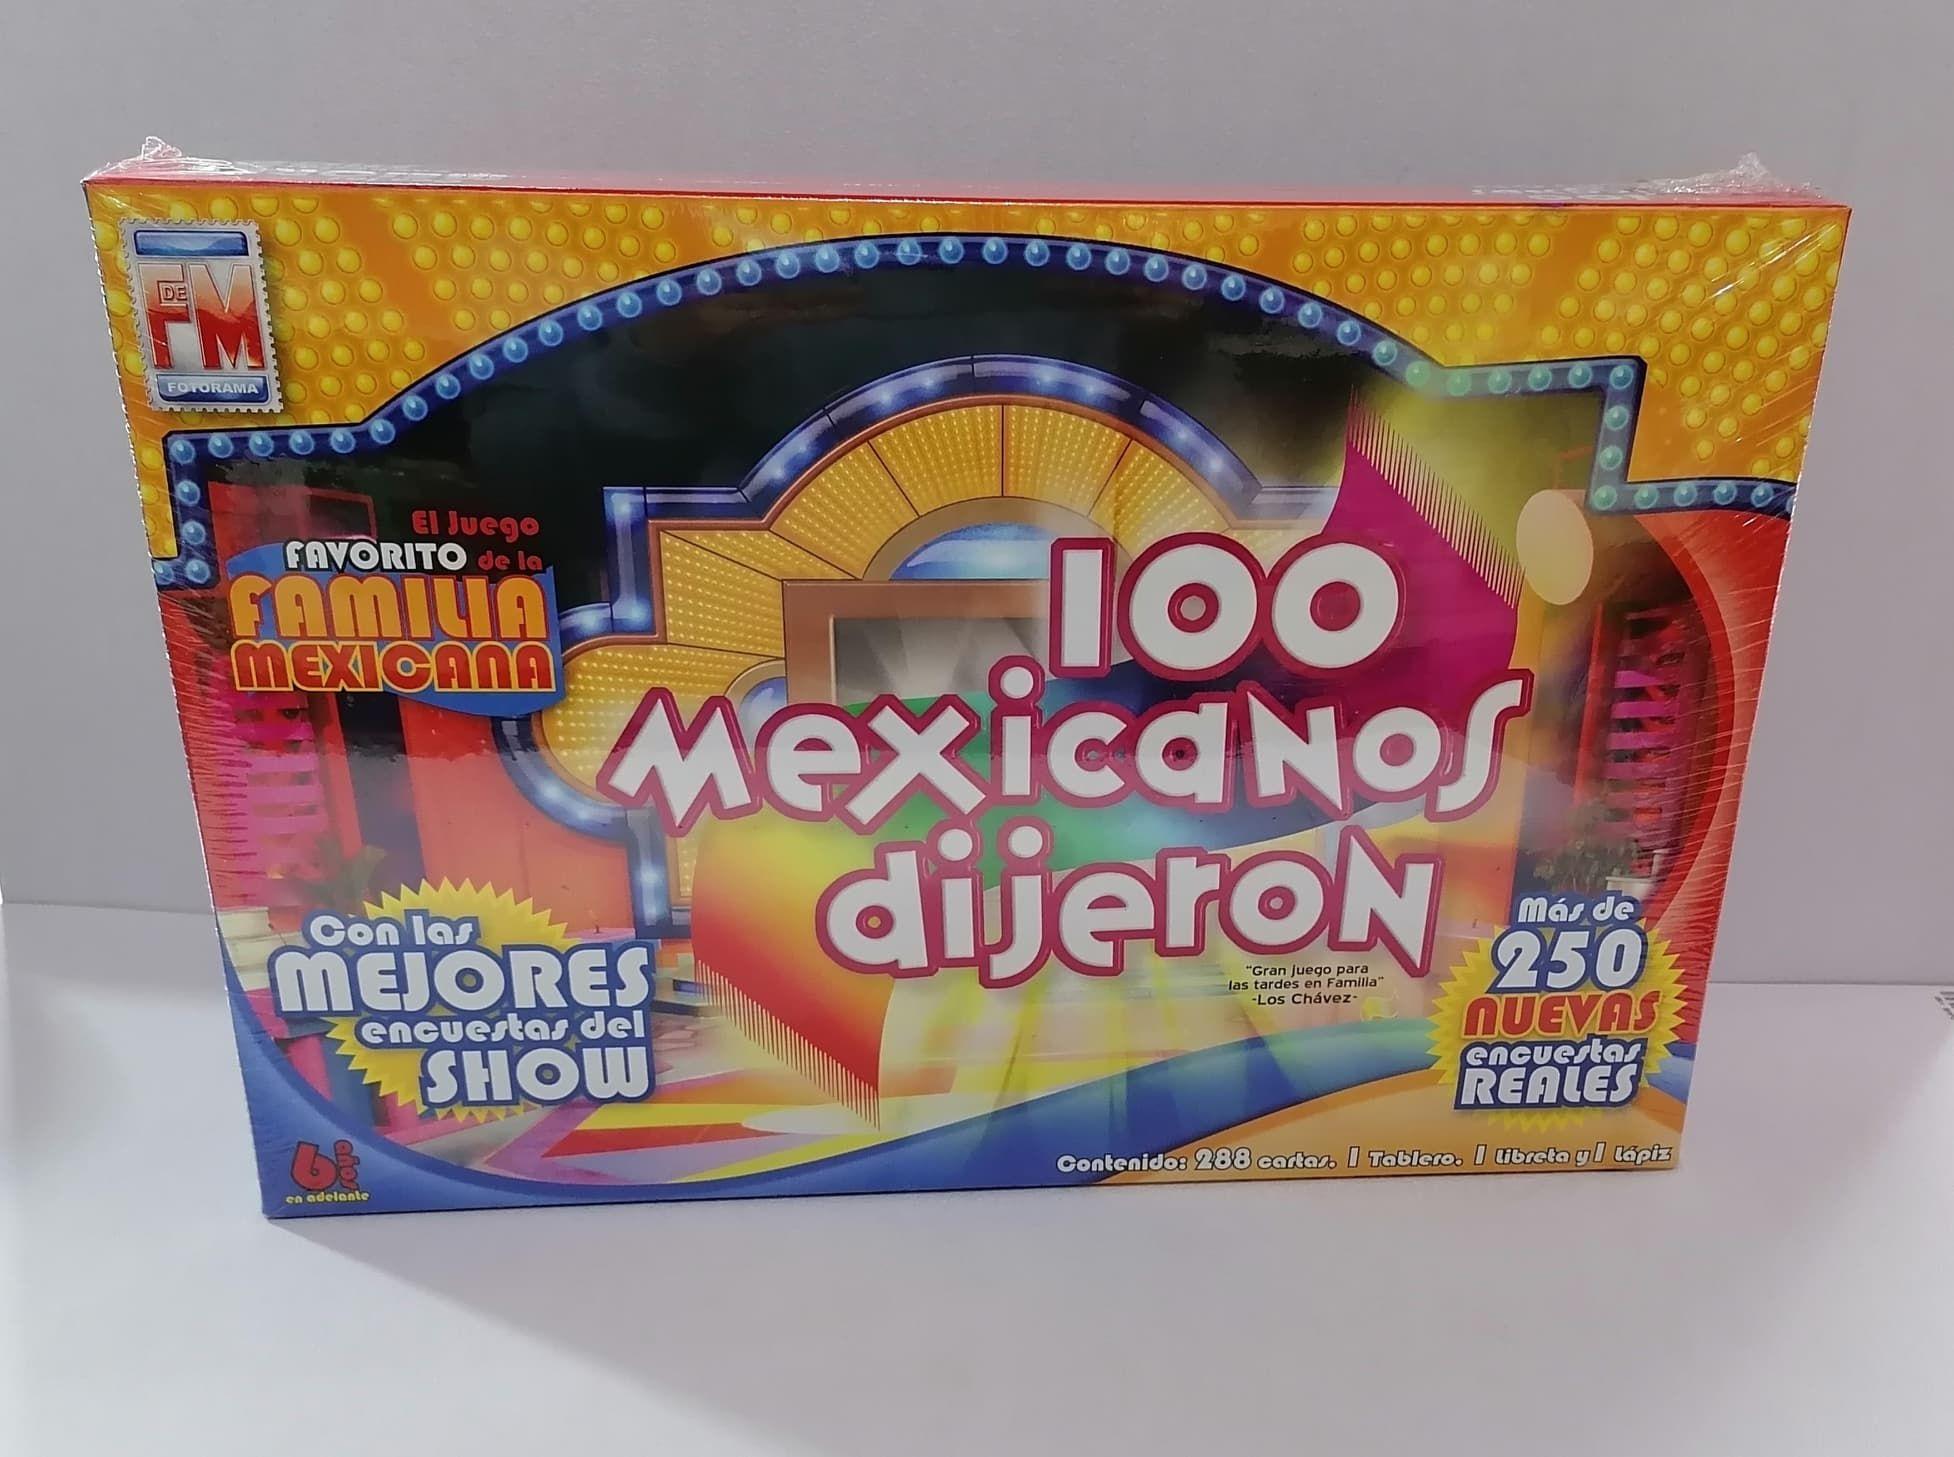 JUEGO DE MESA CIEN MEXICANOS DIJERON